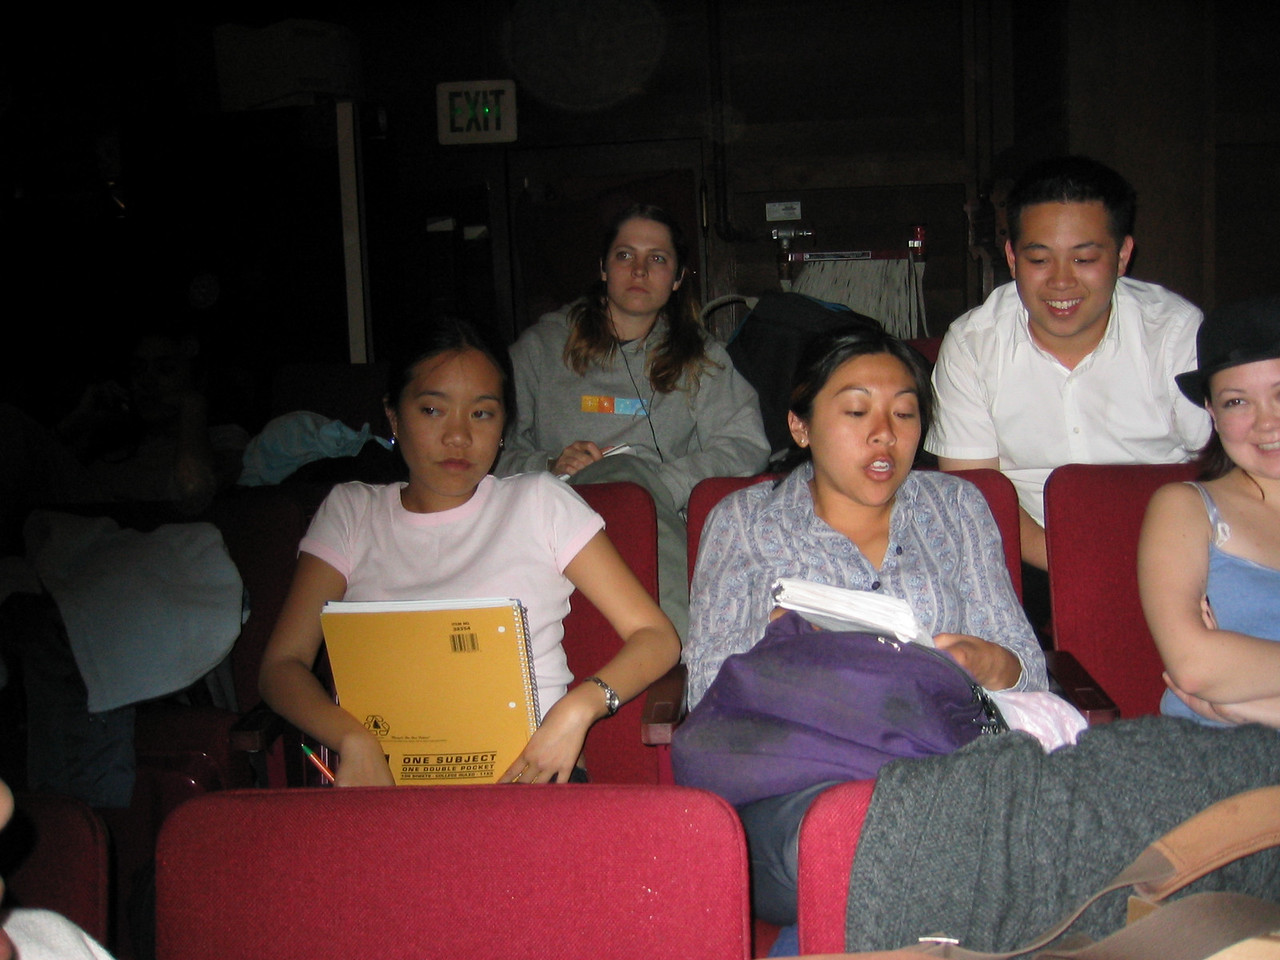 2003 - Stephanie Wong, Stephanie Johnson, Cheryl Chan, uhhh, & Cathy Clerkin awaiting our stage rehearsal for show